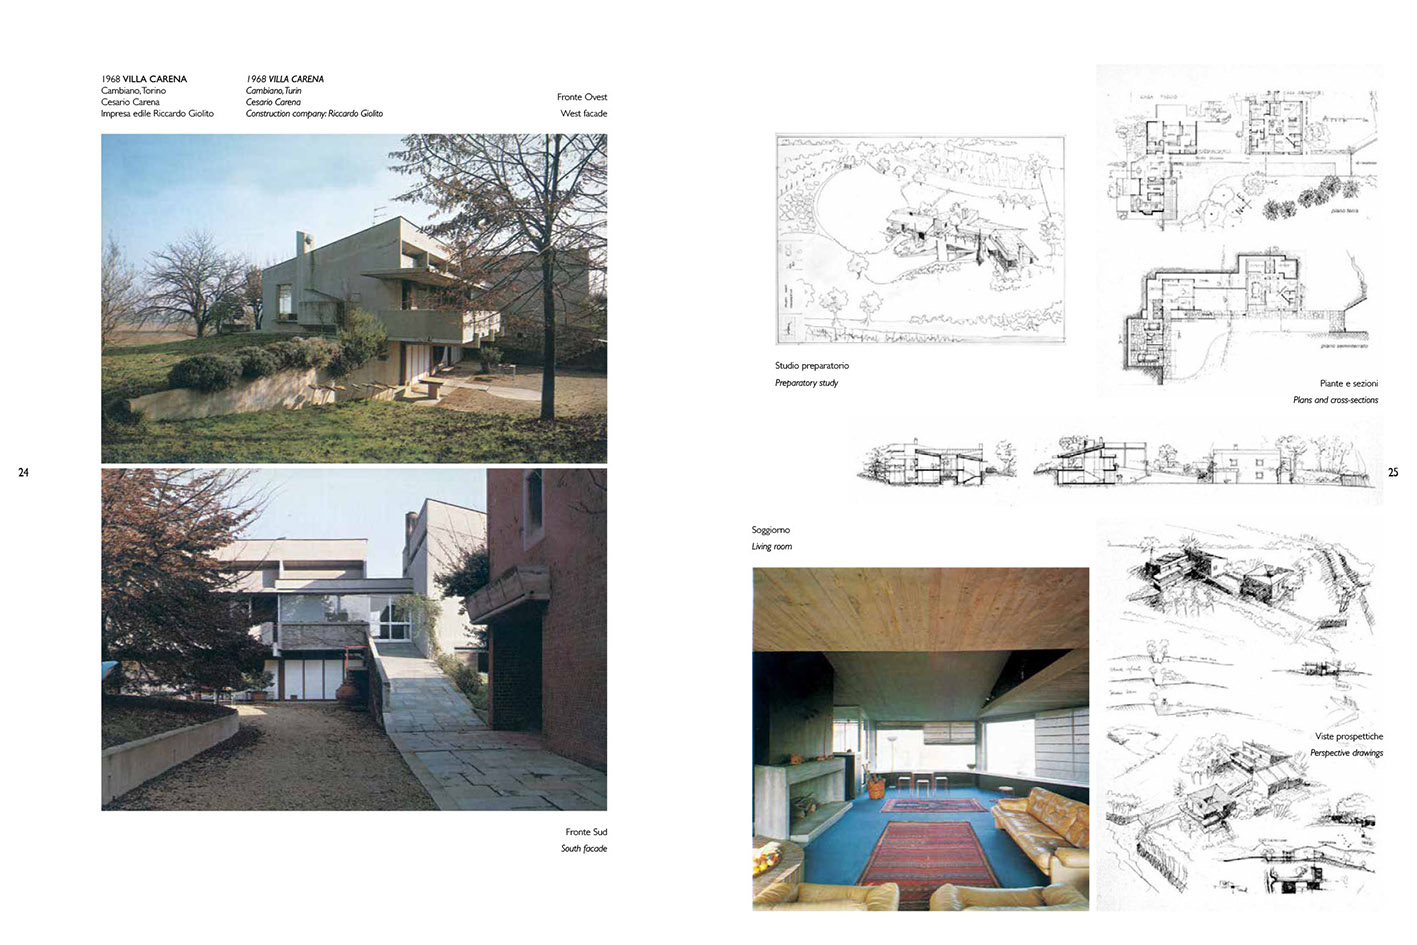 Diario Cesario Studio di Arch Torino-14 copy.jpg